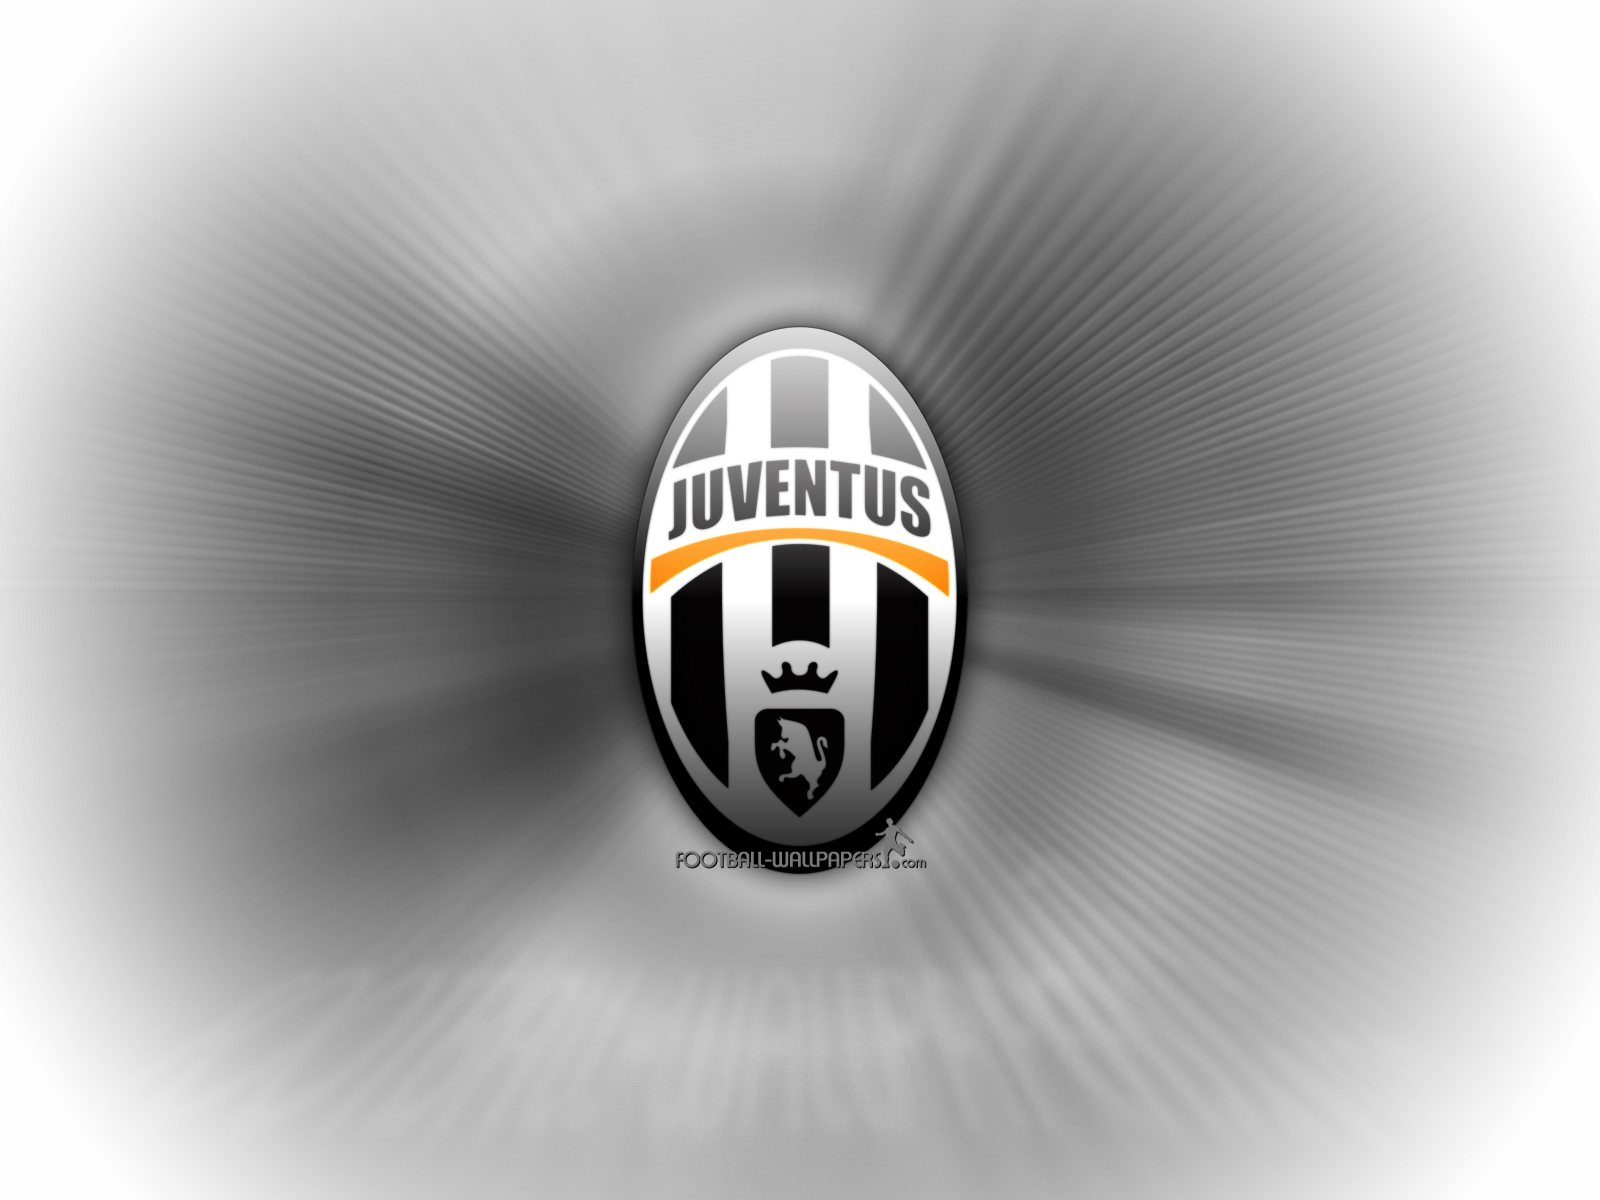 http://1.bp.blogspot.com/-aMGpOeVFtKw/TYETFpenfWI/AAAAAAAAC8U/DqmW7IVtdrI/s1600/Juventus.jpg